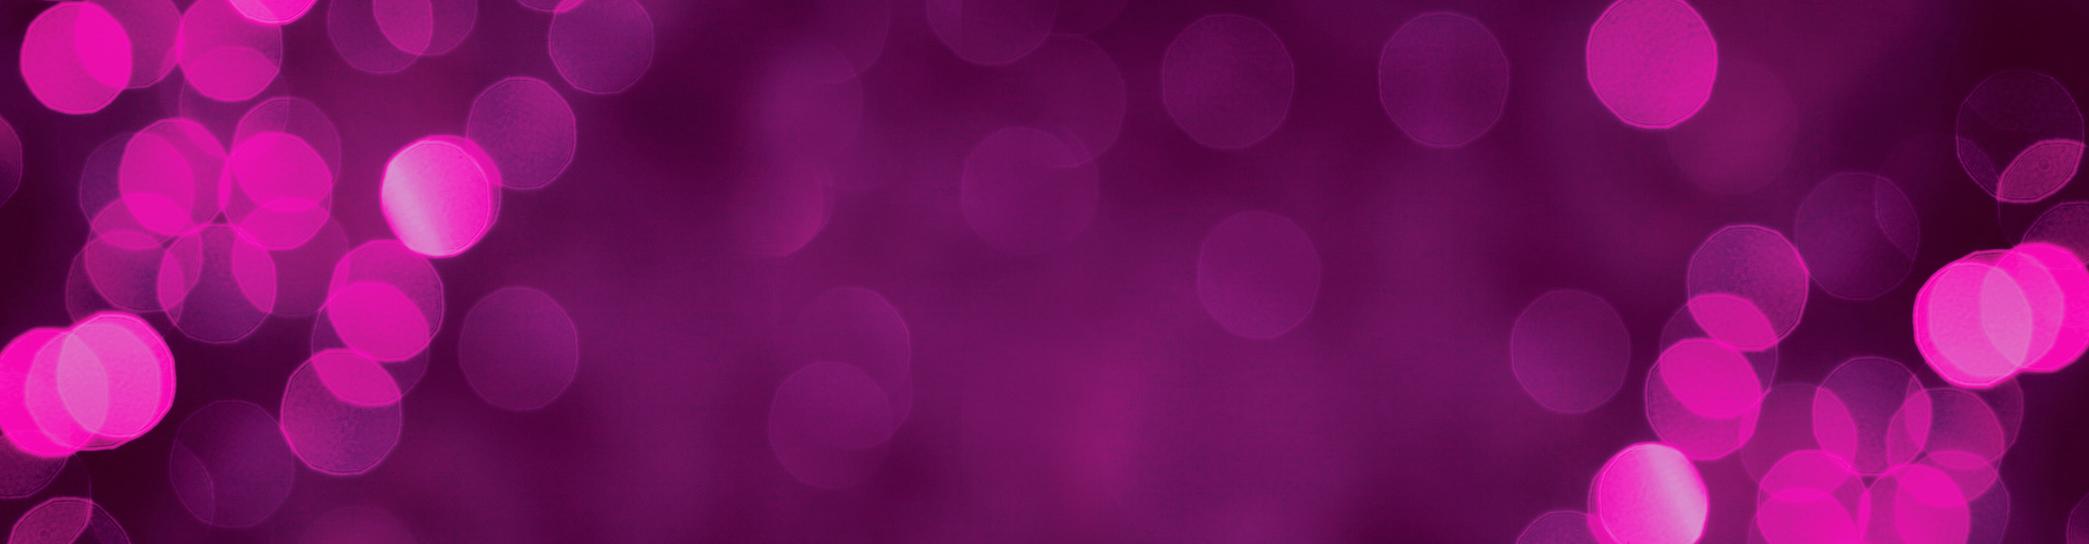 fond pink